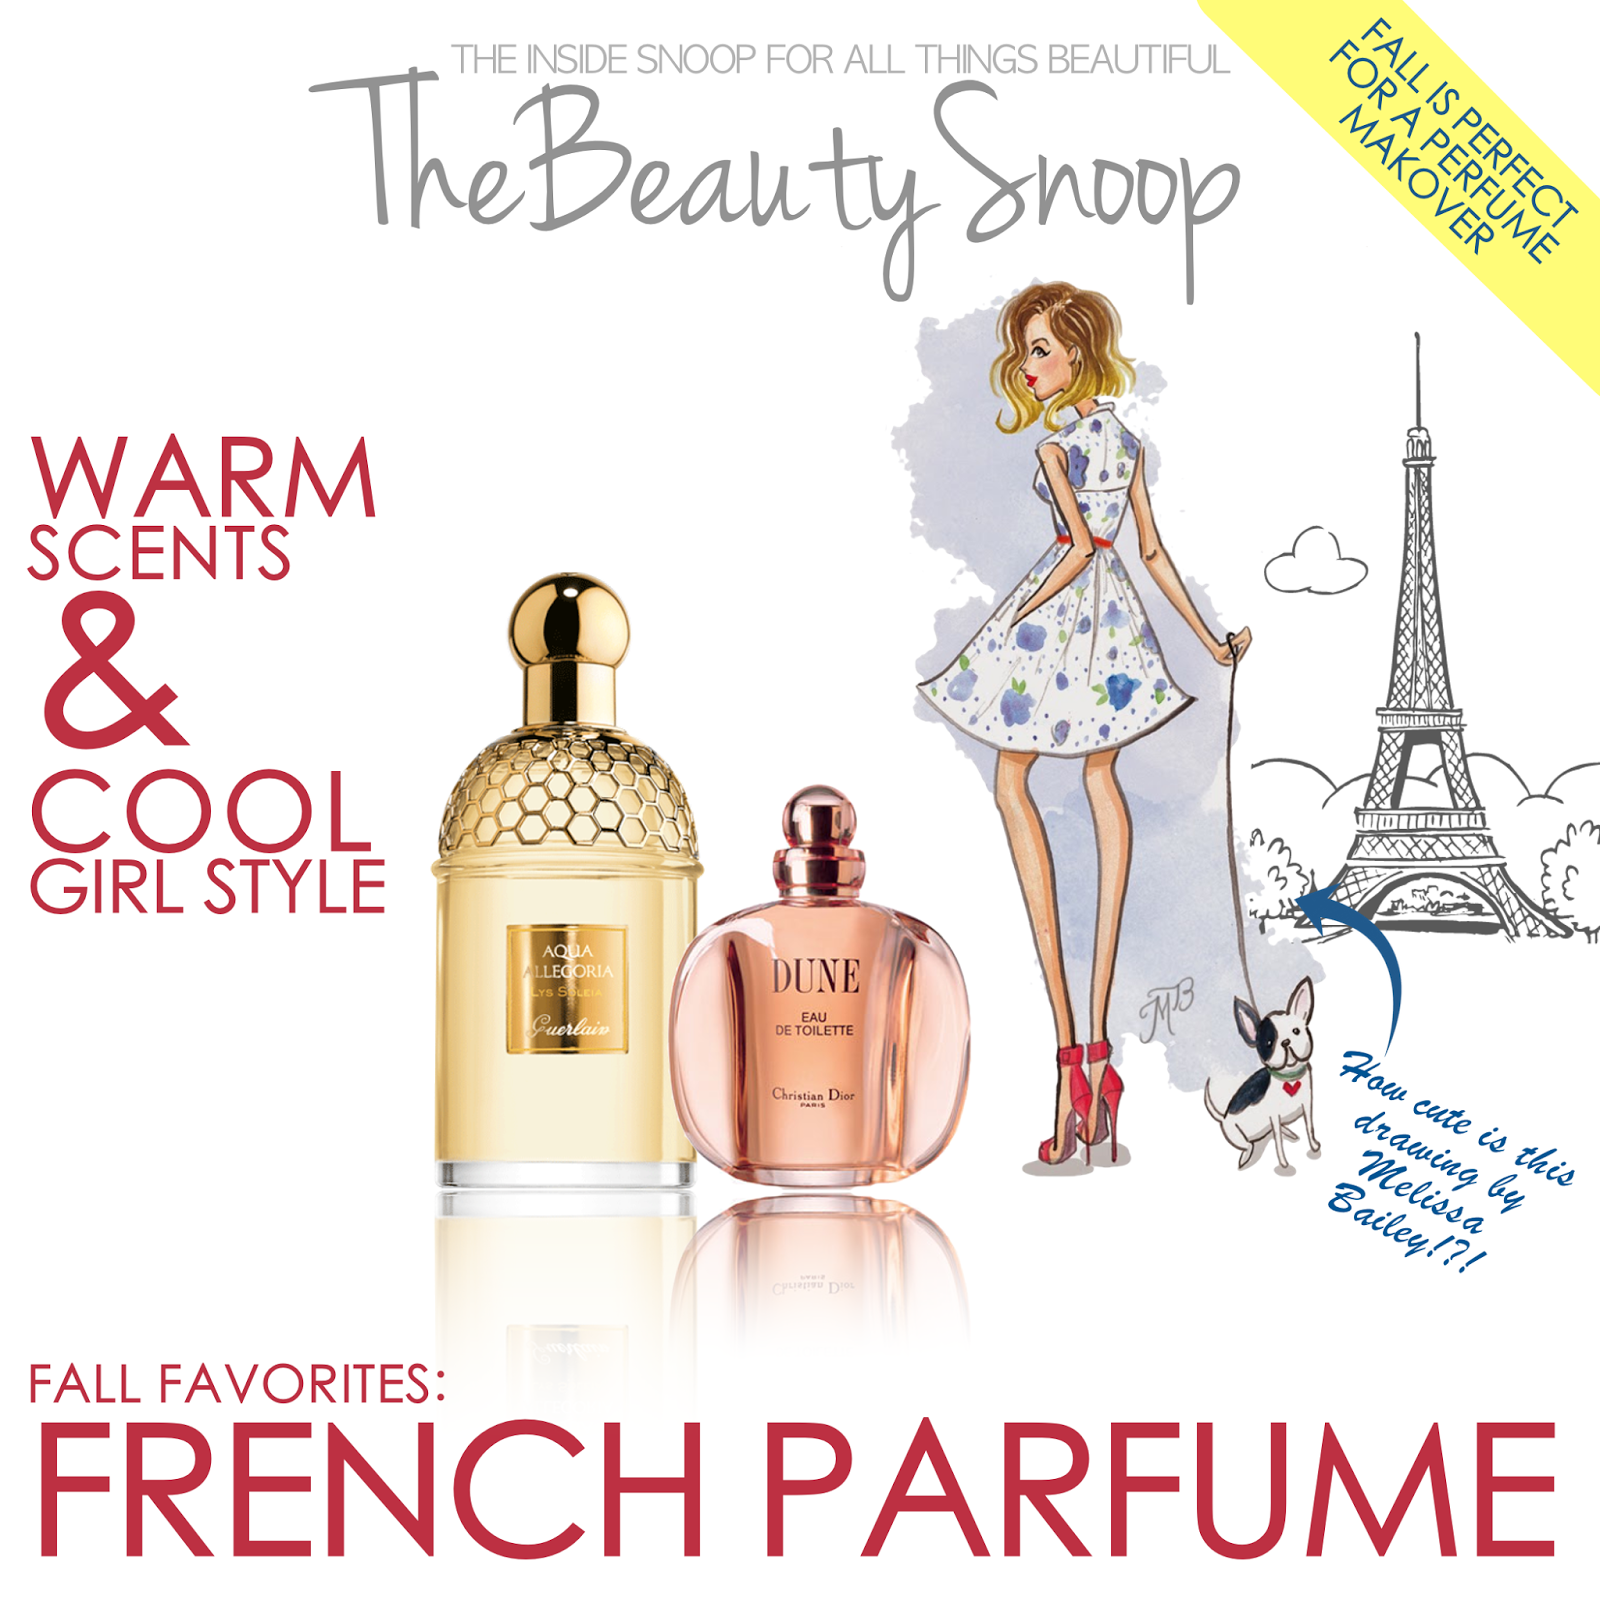 french parfume favorites, Dior Dune, Guerlain Aqua Allegoria Lys Soleia